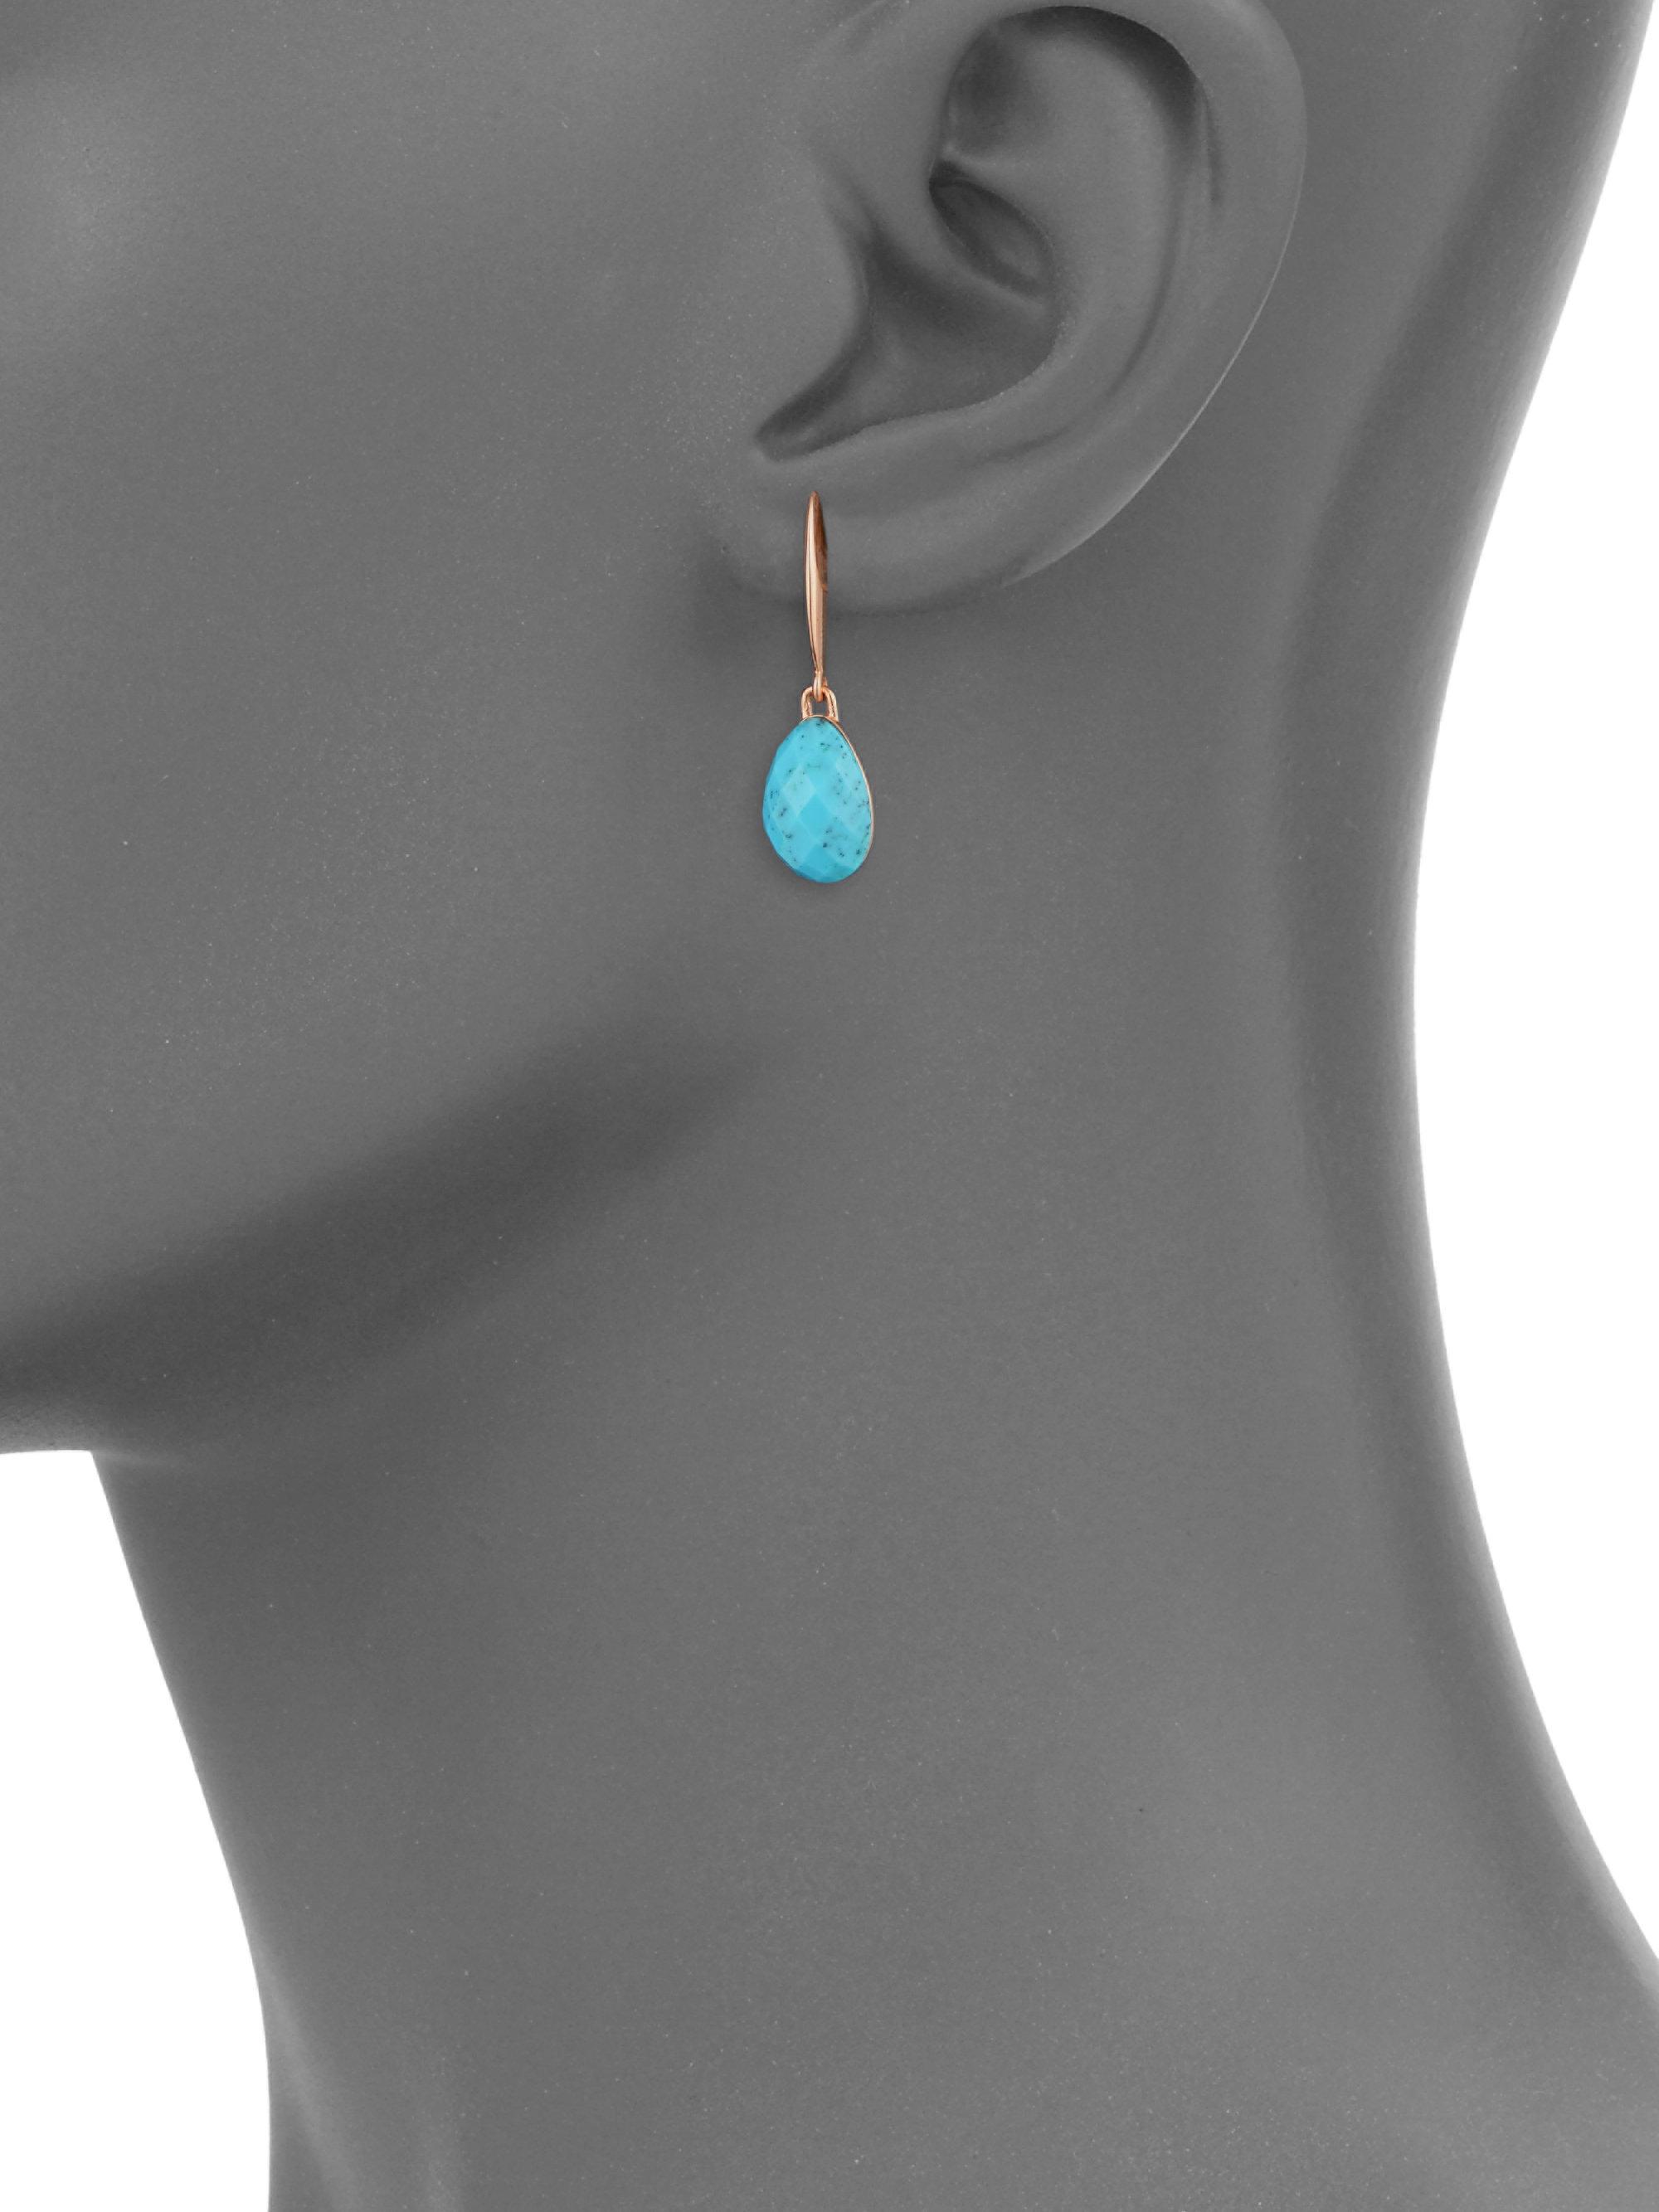 36f7dbfd60bae Monica Vinader Blue Nura Small Turquoise Teardrop Earrings